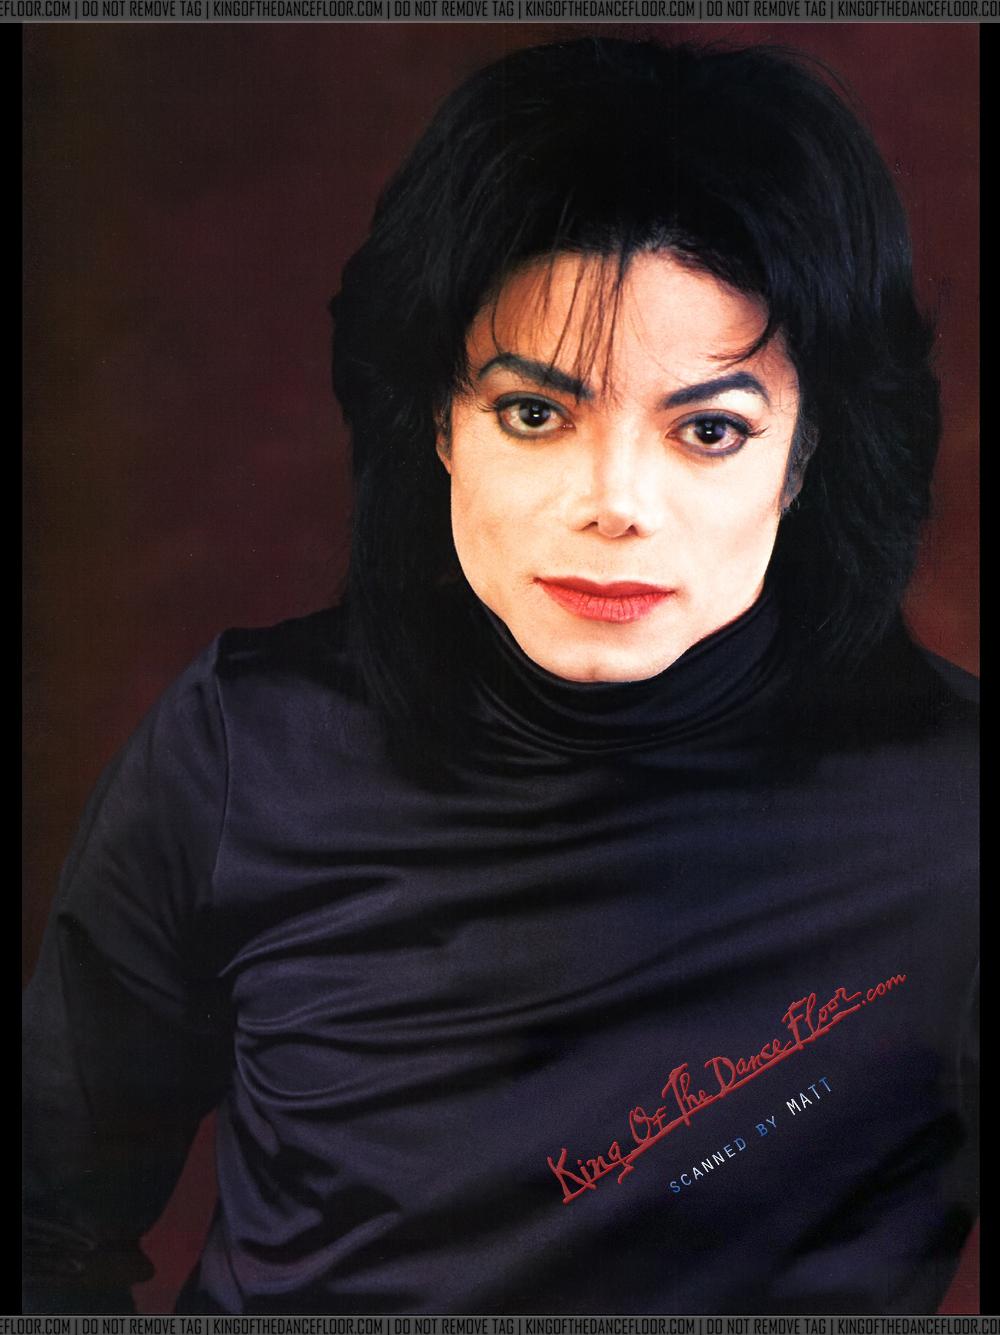 76b16a4b1909c5a40f749d0c84cd7bb8 Png 561 697 Michael Jackson Bad Michael Jackson Pics Michael Jackson